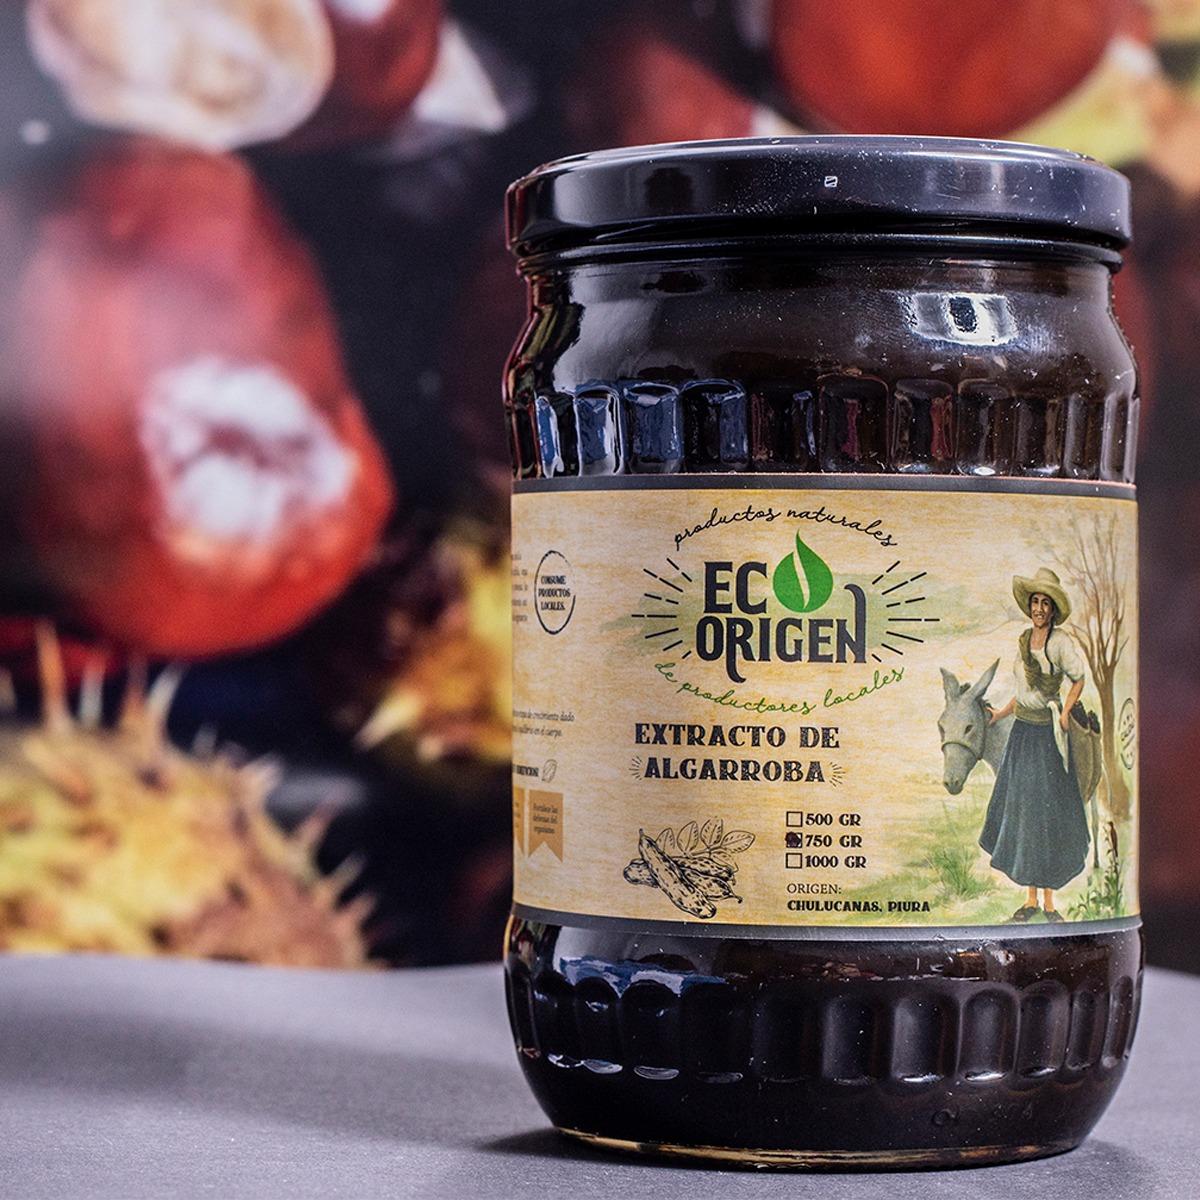 Extracto de algarroba Eco Origen x 750 gr